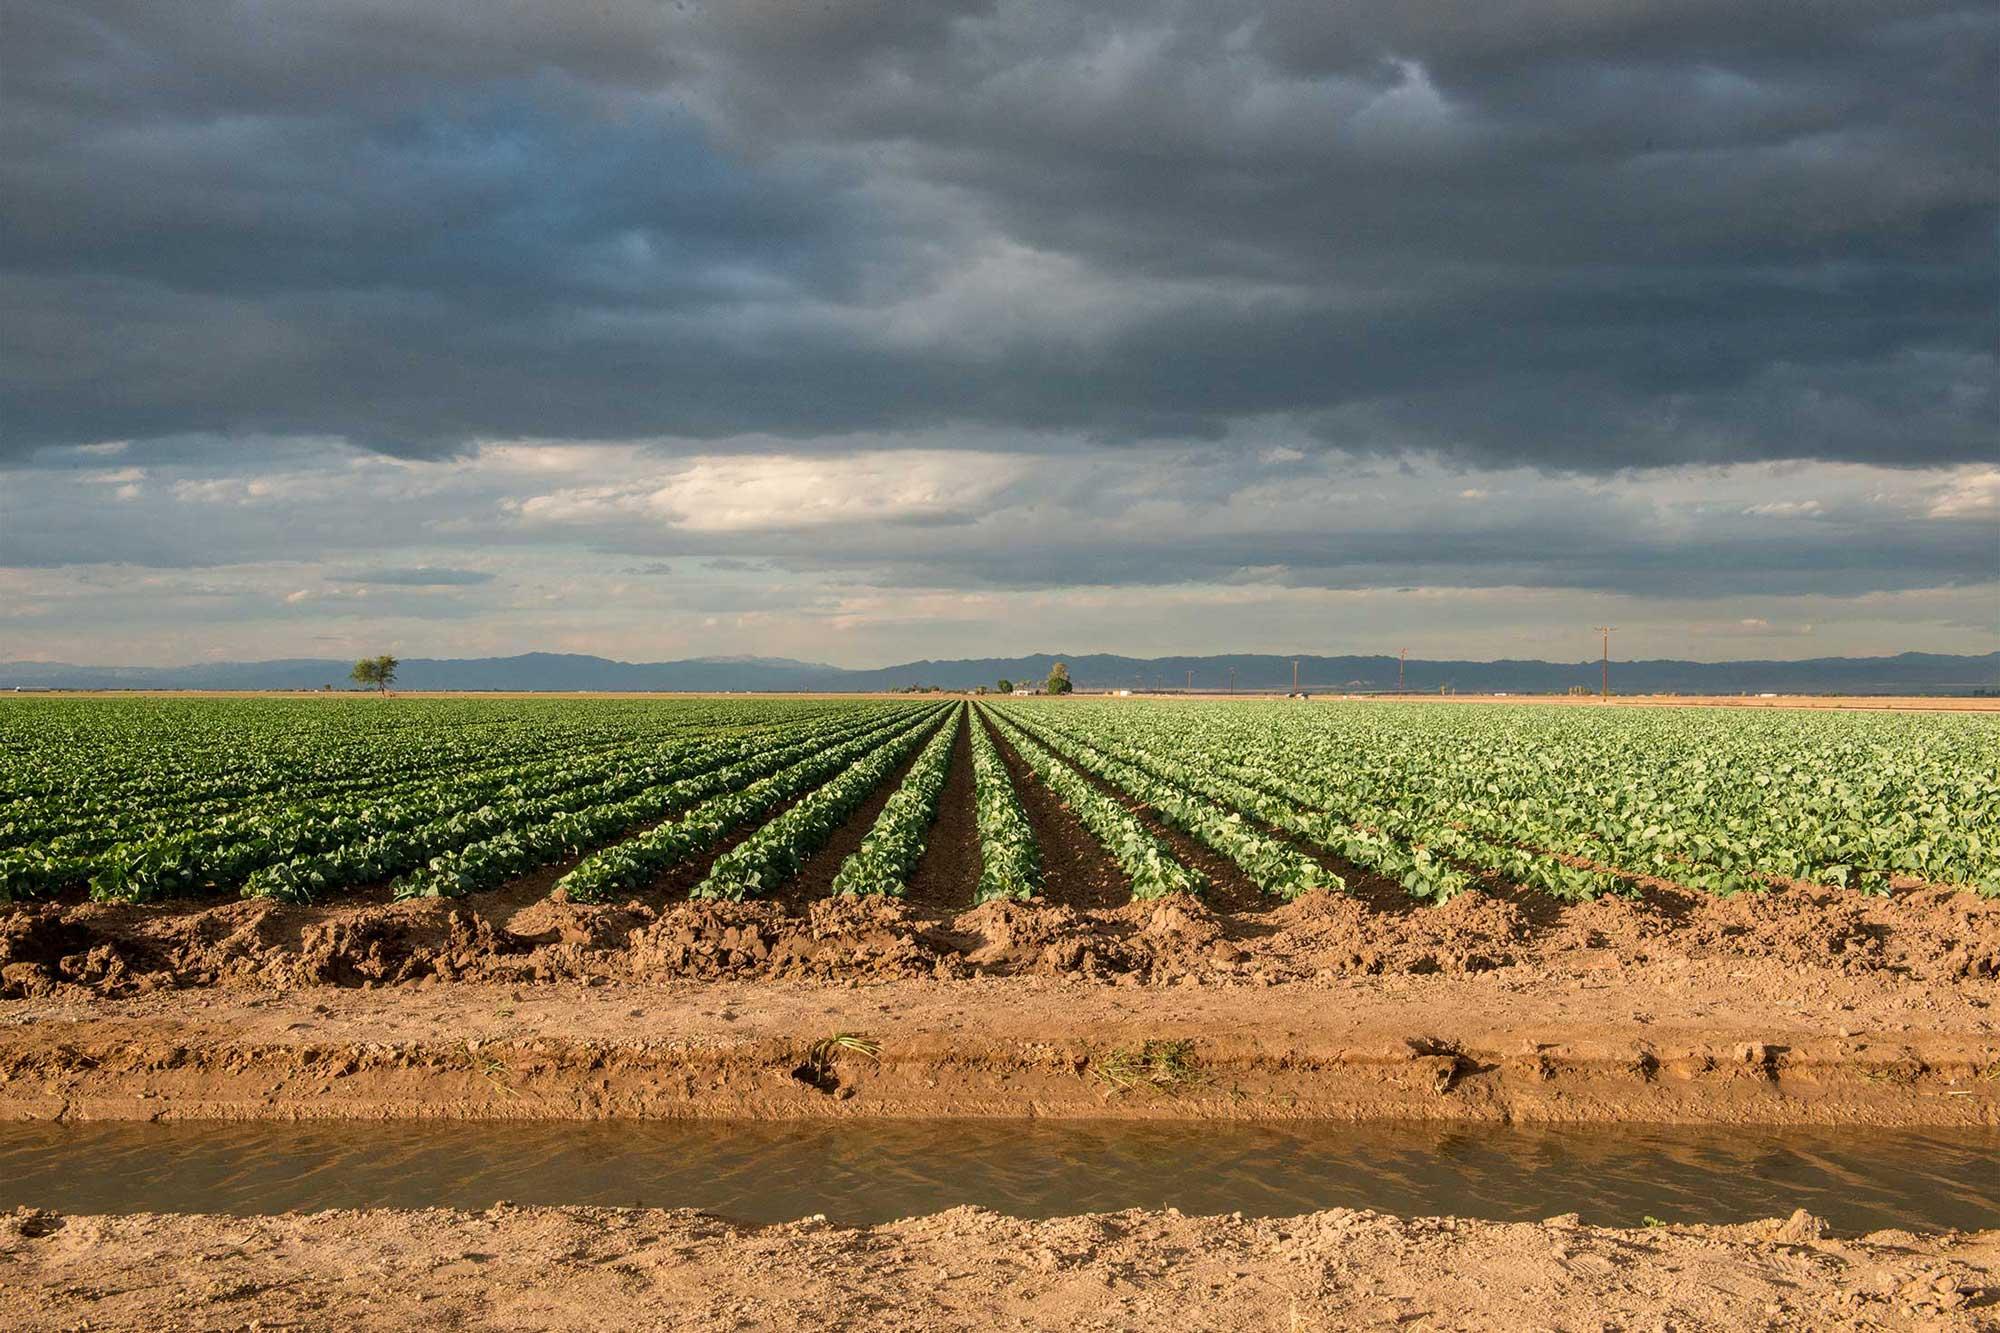 photo - Agriculture Field in Brawley, California - Pixel CA DWR